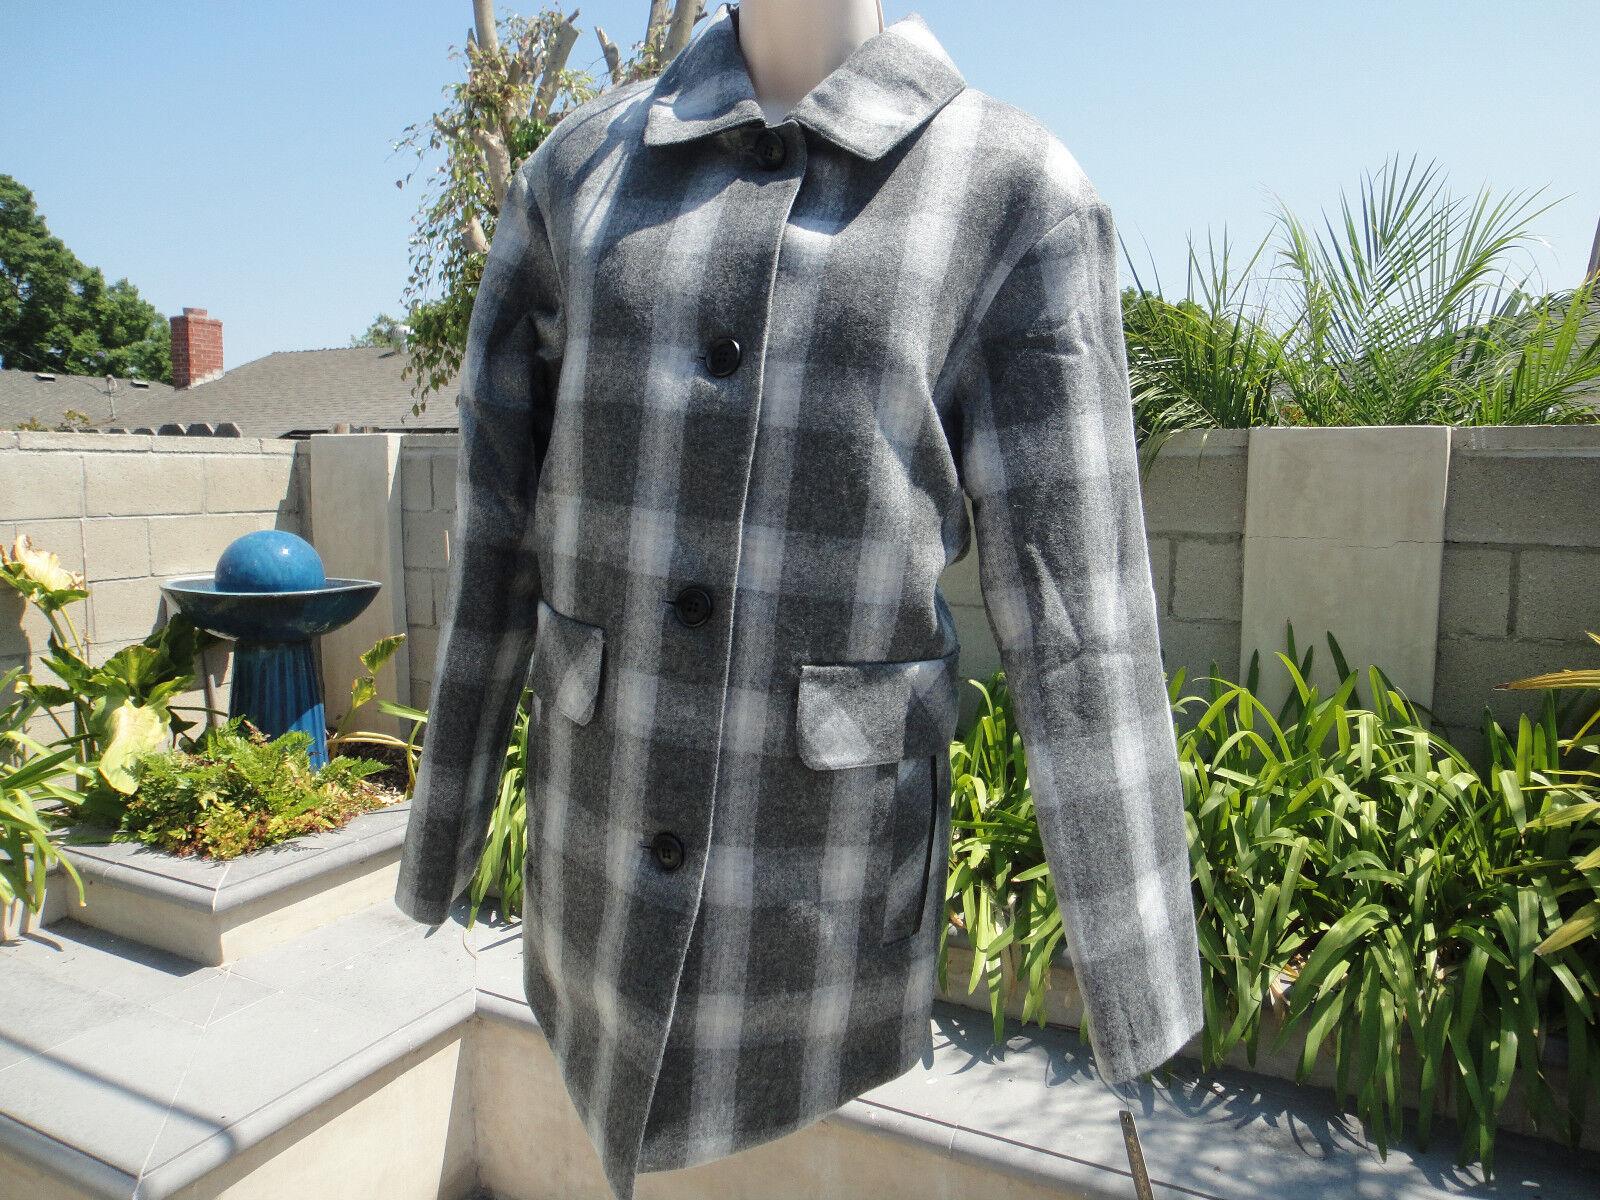 PENDLETON Wool Blend Shirting Plaid Coat, Quilt Lining Grey Tones, Wmns Sz L NWT